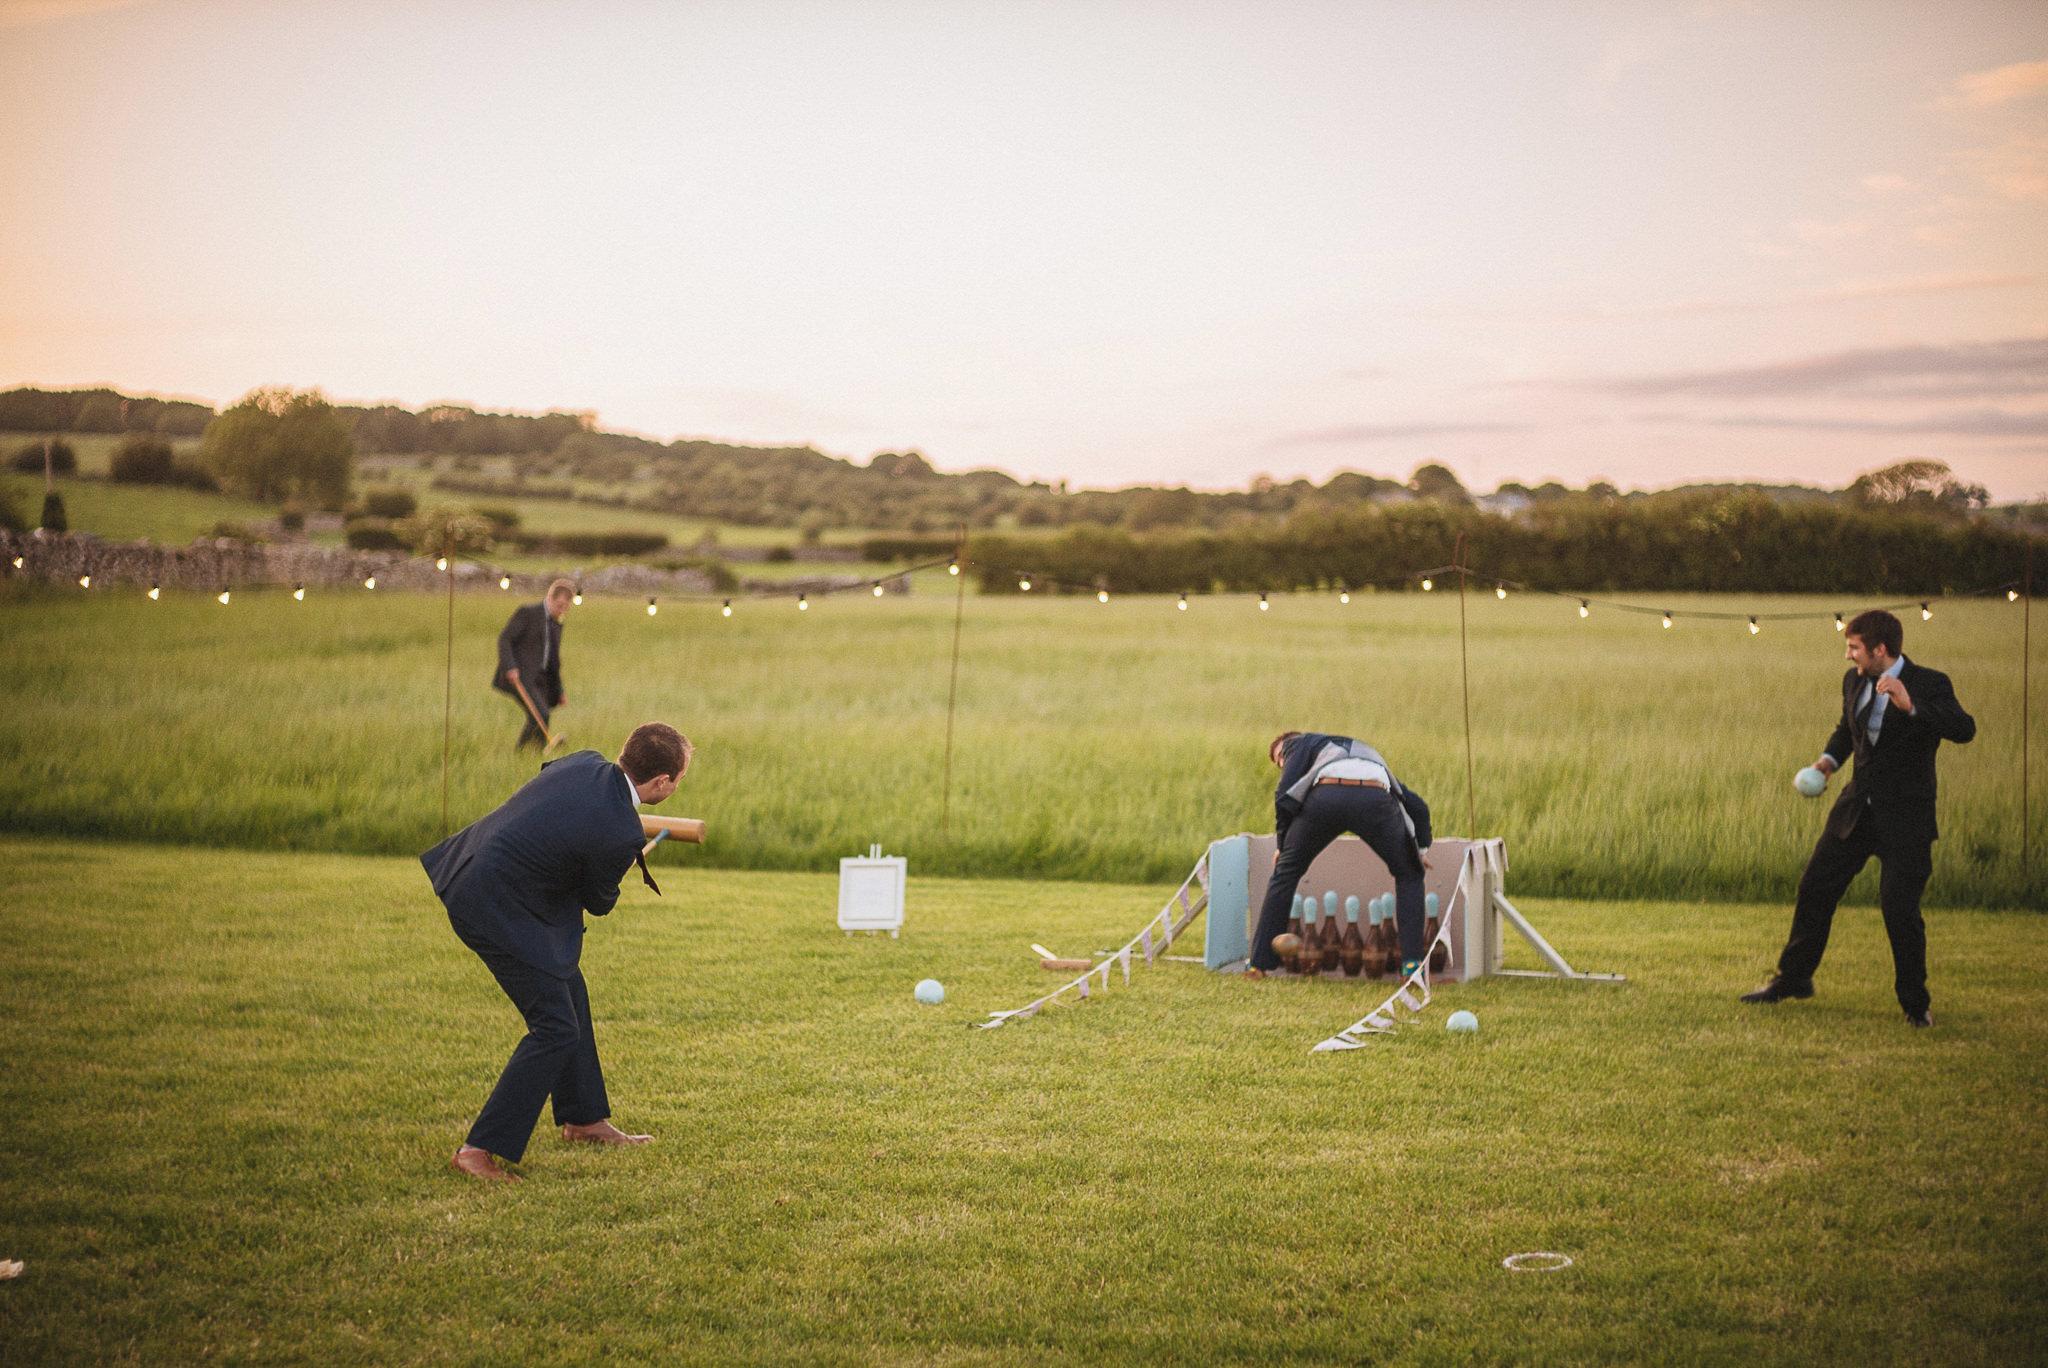 paul-marbrook-Farm-Wedding-Photographer-Lancashire-90082